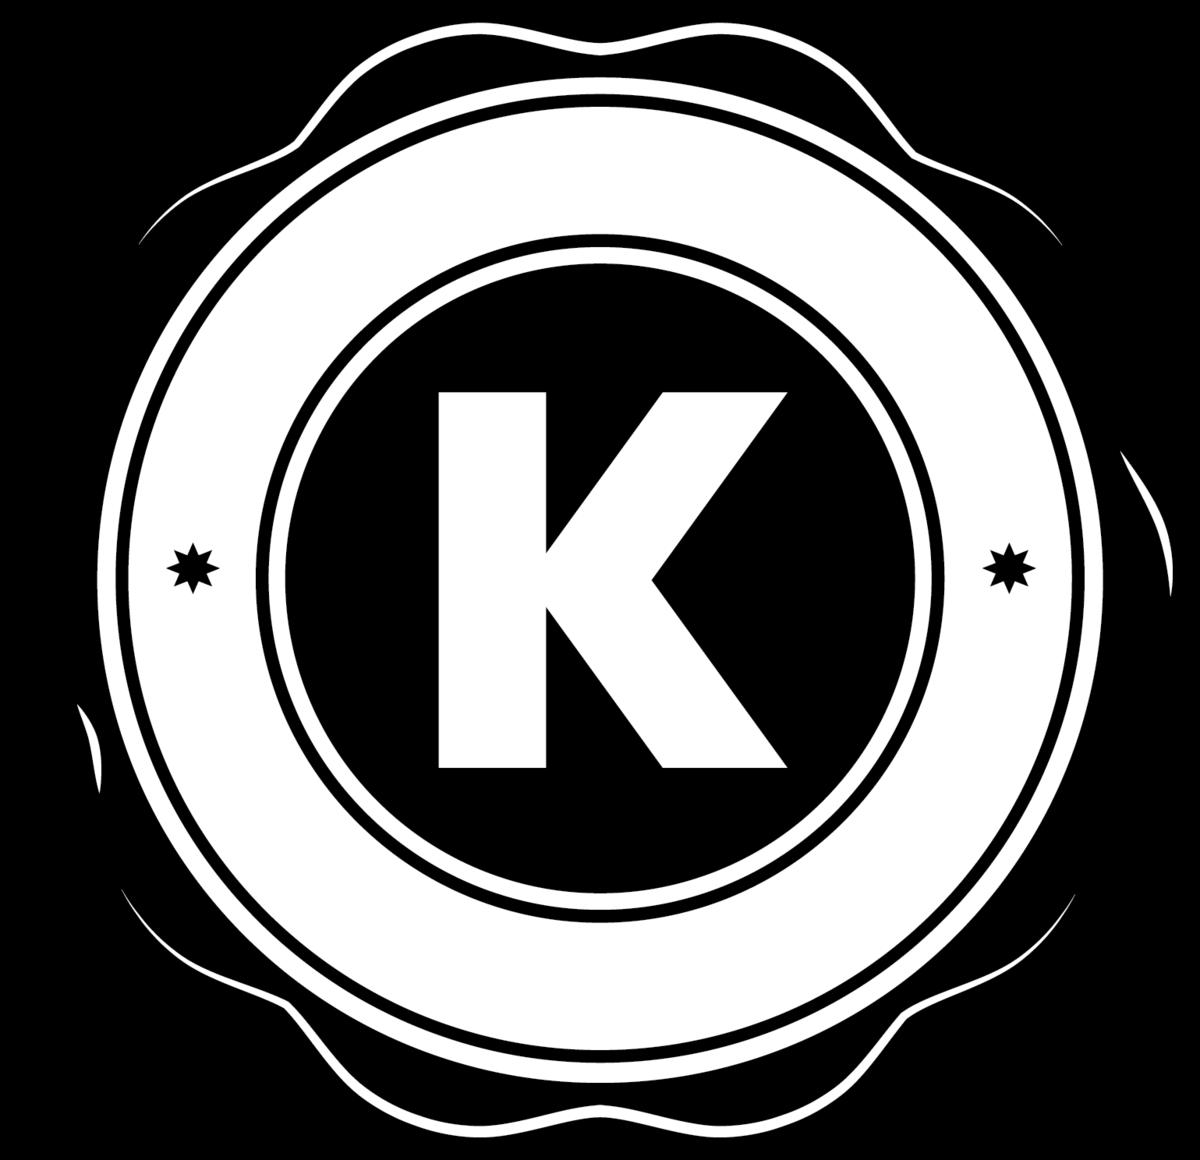 Seal k wikipedia buycottarizona Choice Image